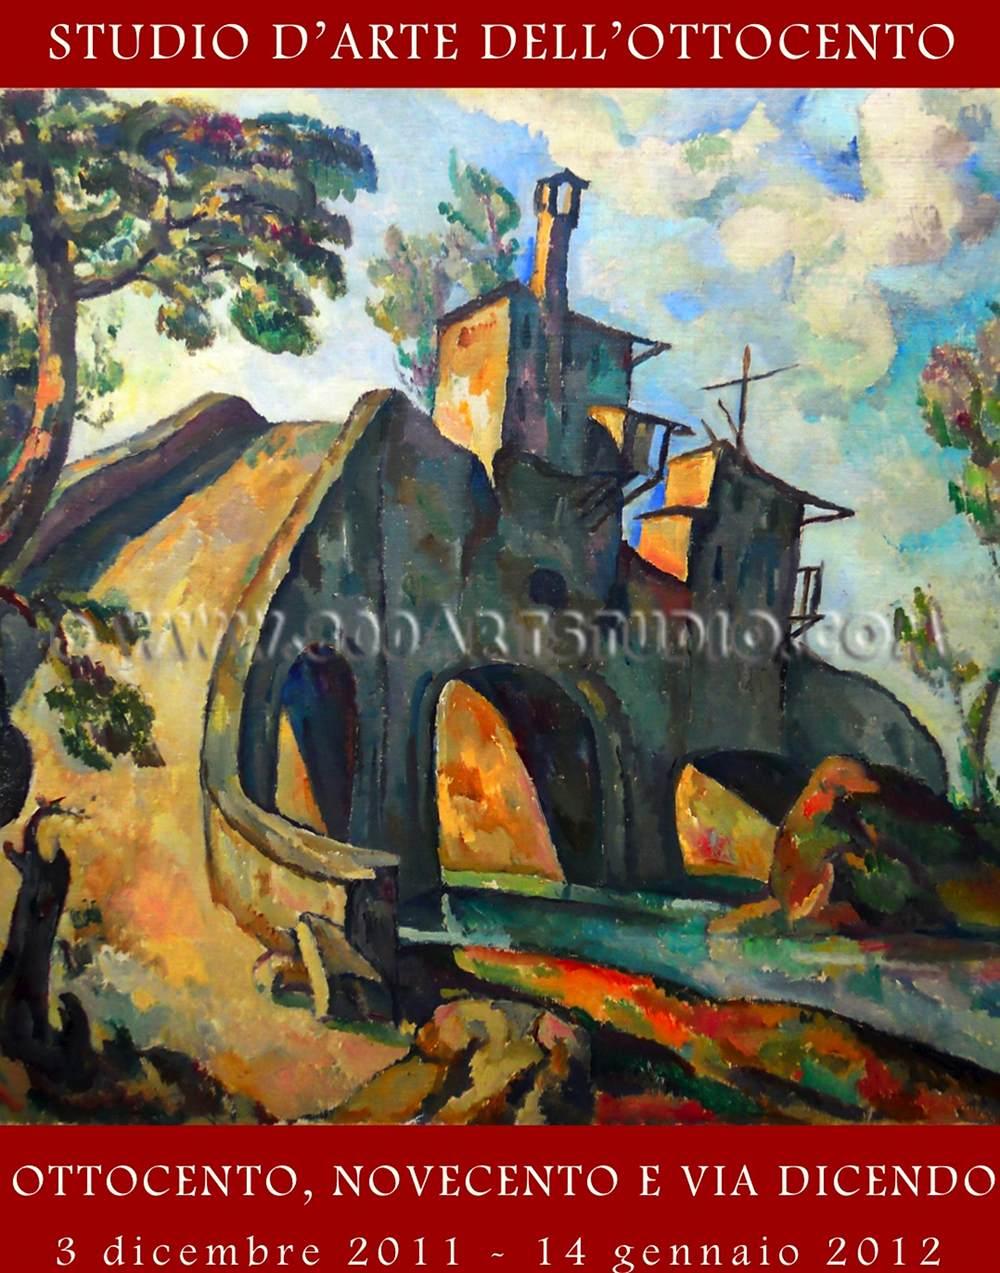 Ottocento novecento 800artstudio vendita dipinti online for Vendita dipinti online